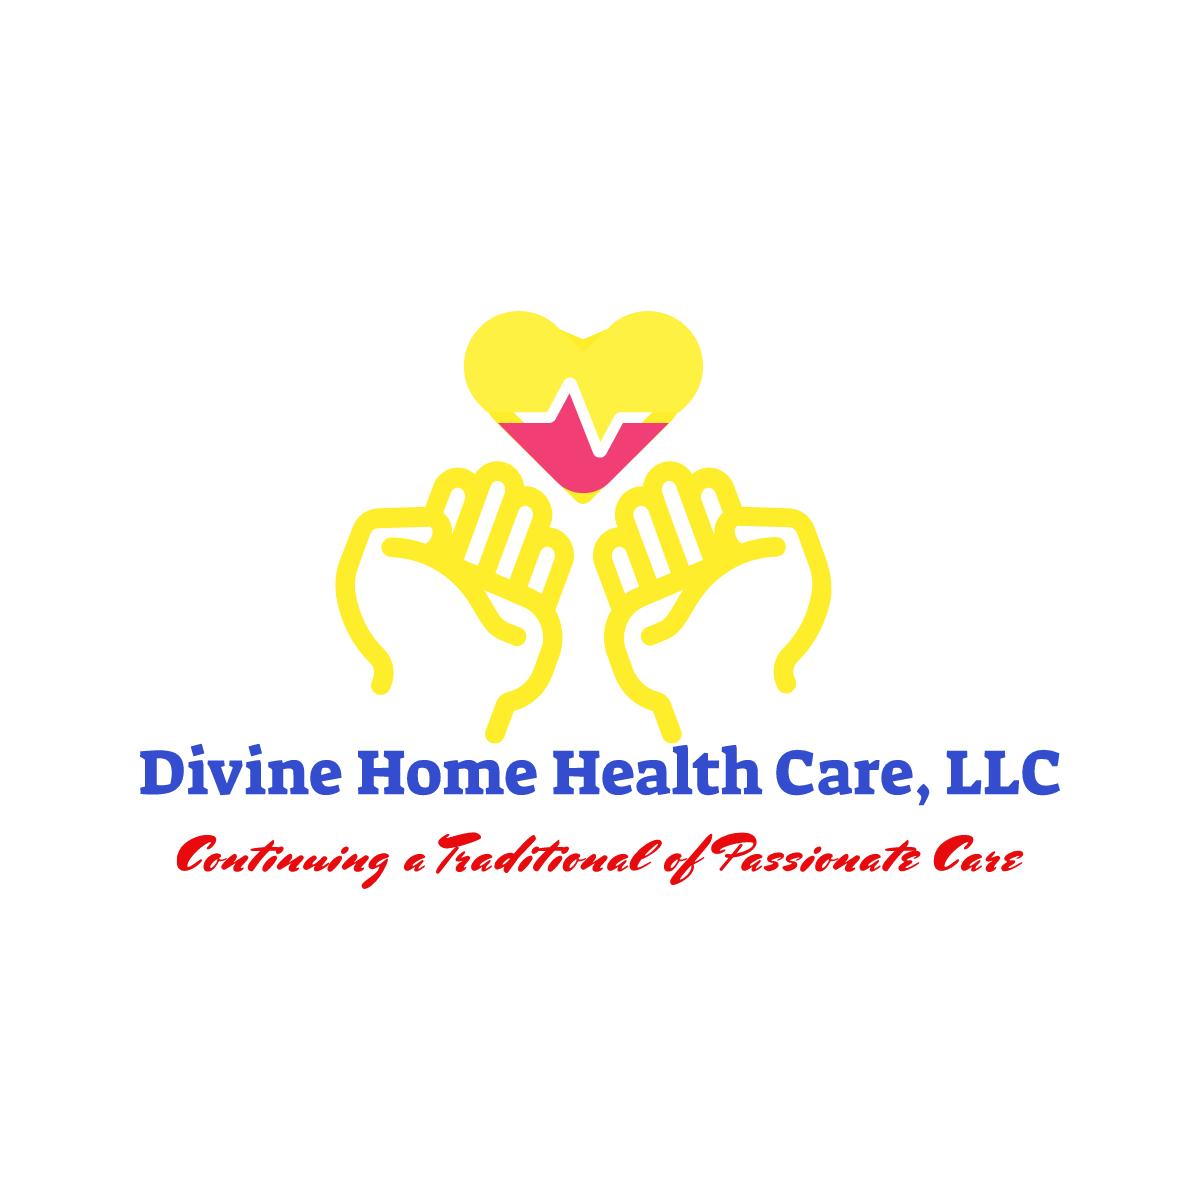 Divine Home Health Care Llc logo